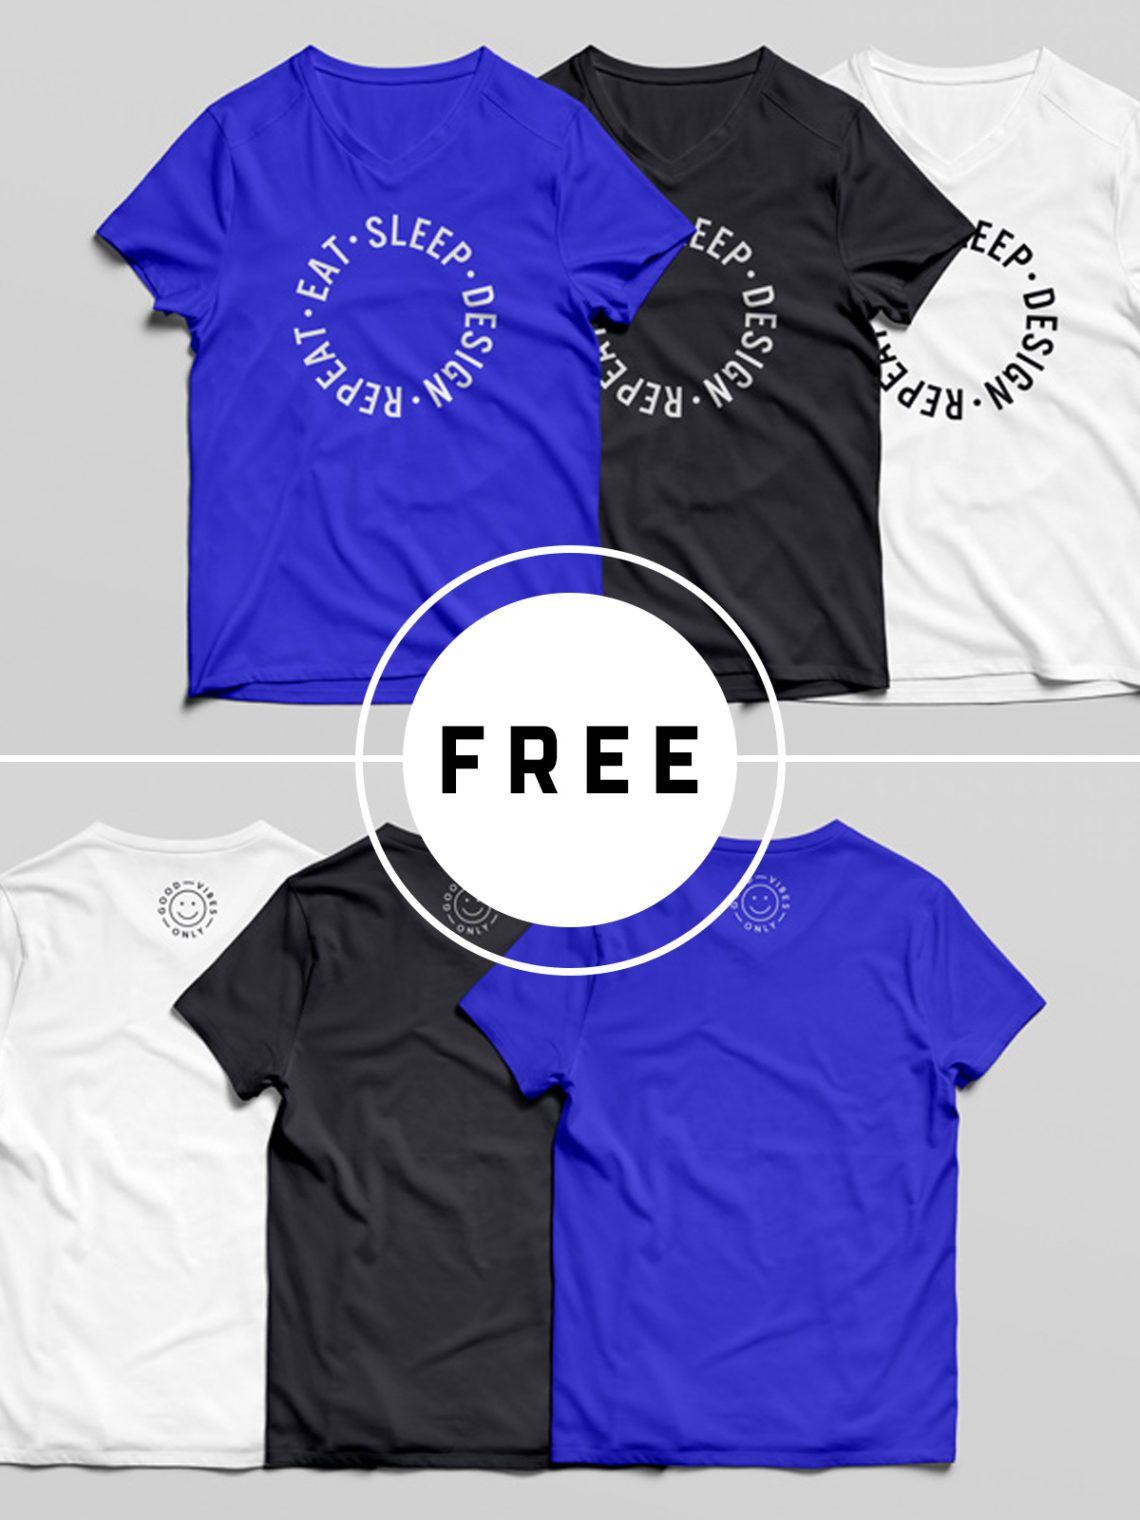 Download 25 Multipurpose Free T Shirt Mockups For Your Breathtaking Designs Shirt Mockup Tshirt Mockup Clothing Mockup